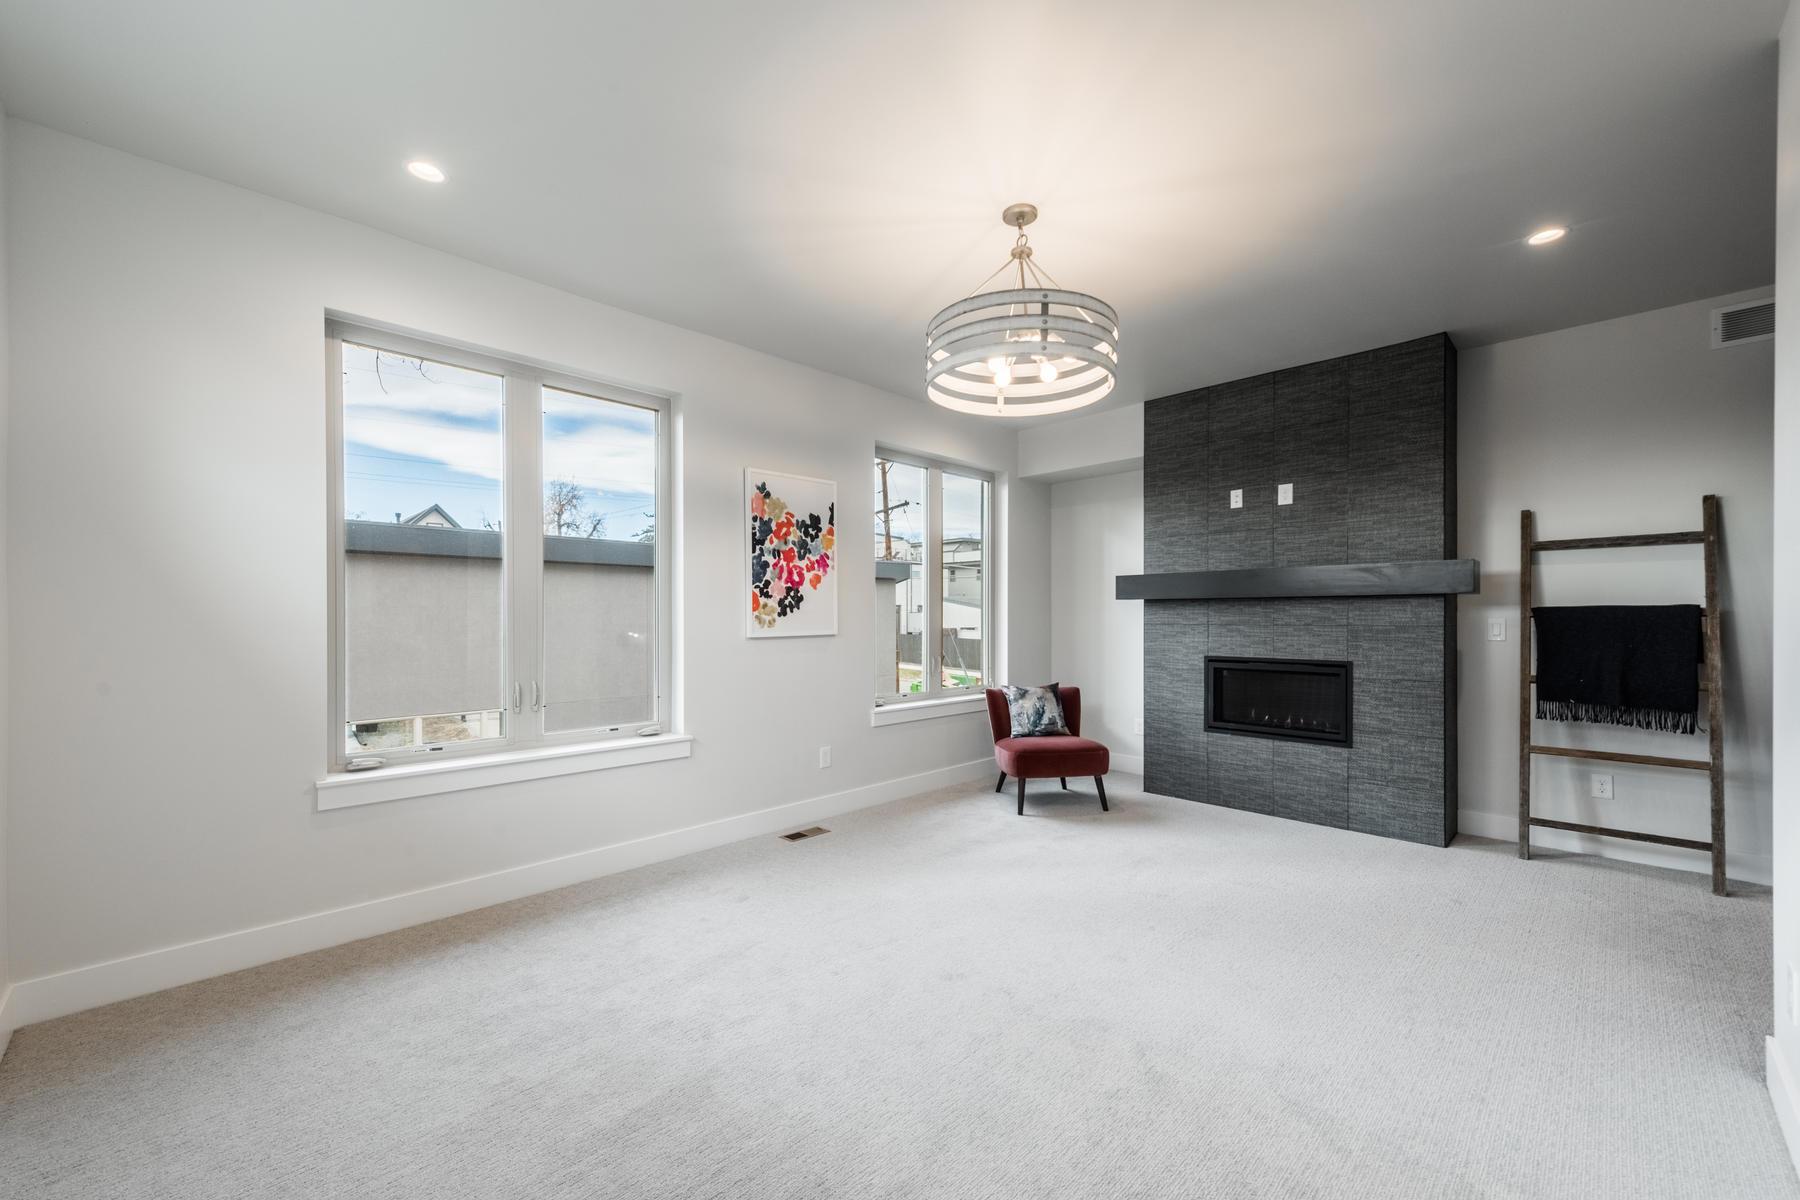 Additional photo for property listing at 3855 Jason Street 3855 Jason Street Denver, Colorado 80211 United States